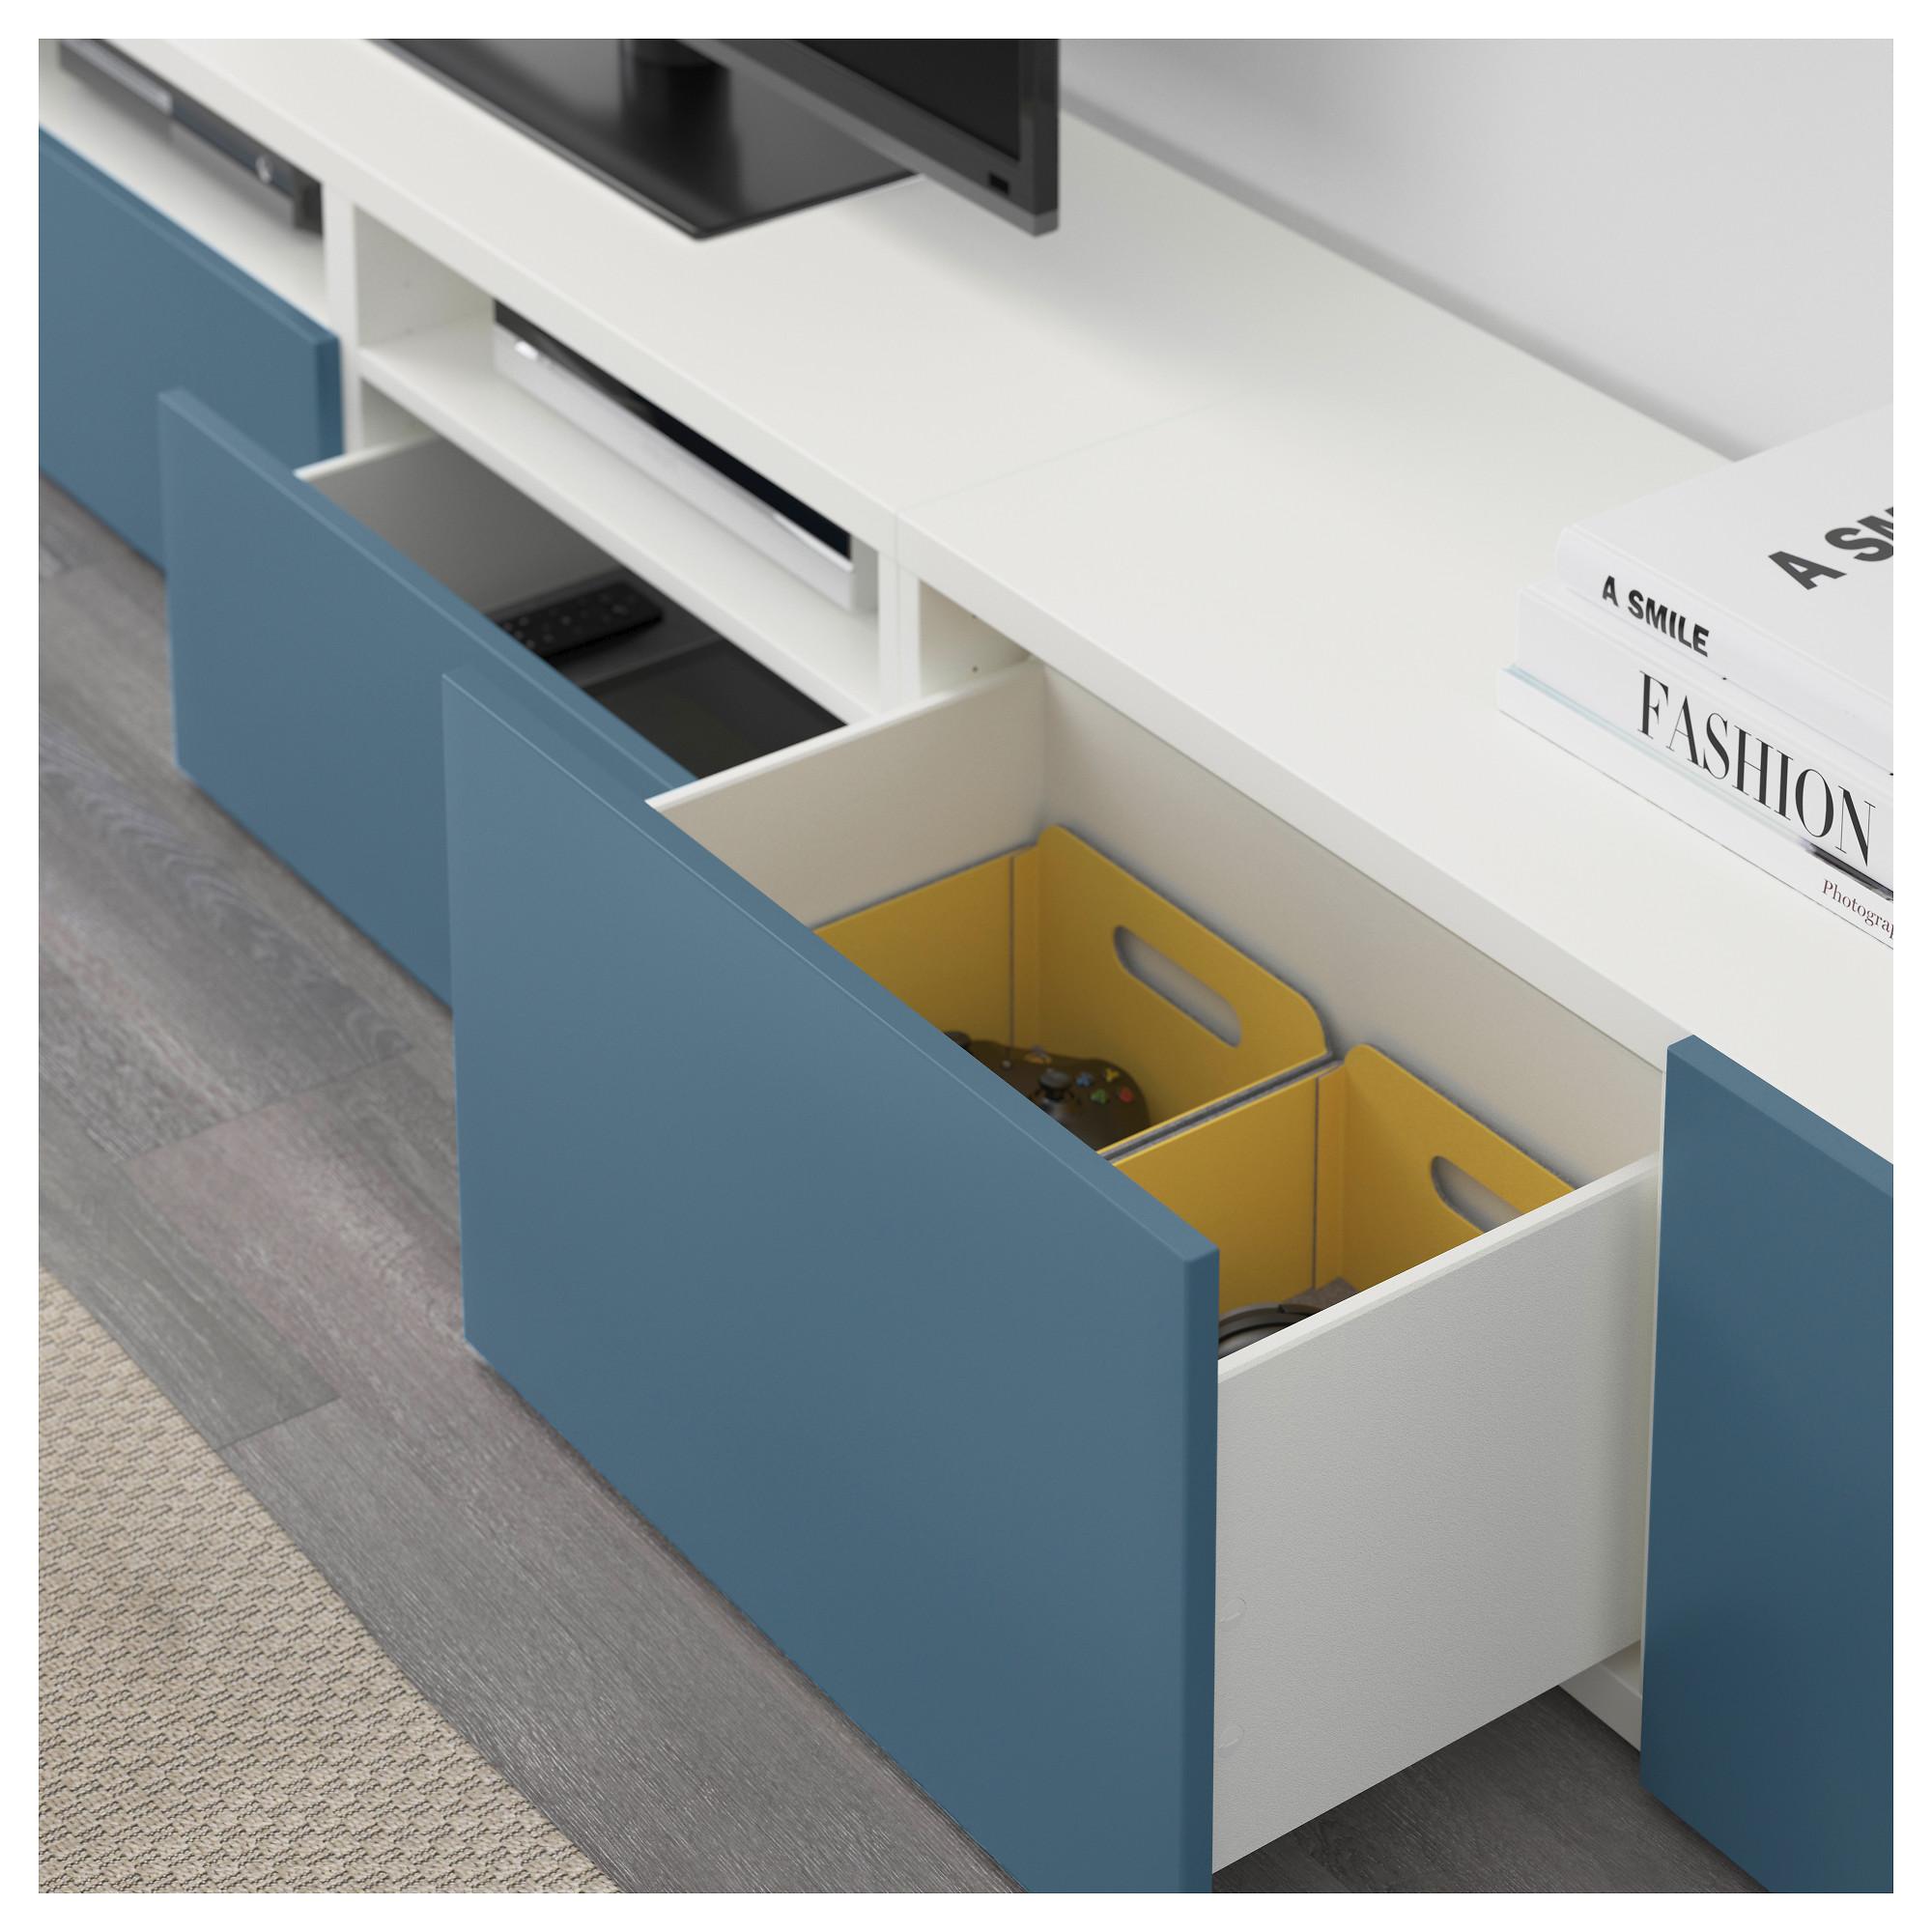 Шкаф для ТВ, комбинация БЕСТО темно-синий артикуль № 492.516.81 в наличии. Интернет сайт IKEA РБ. Недорогая доставка и установка.